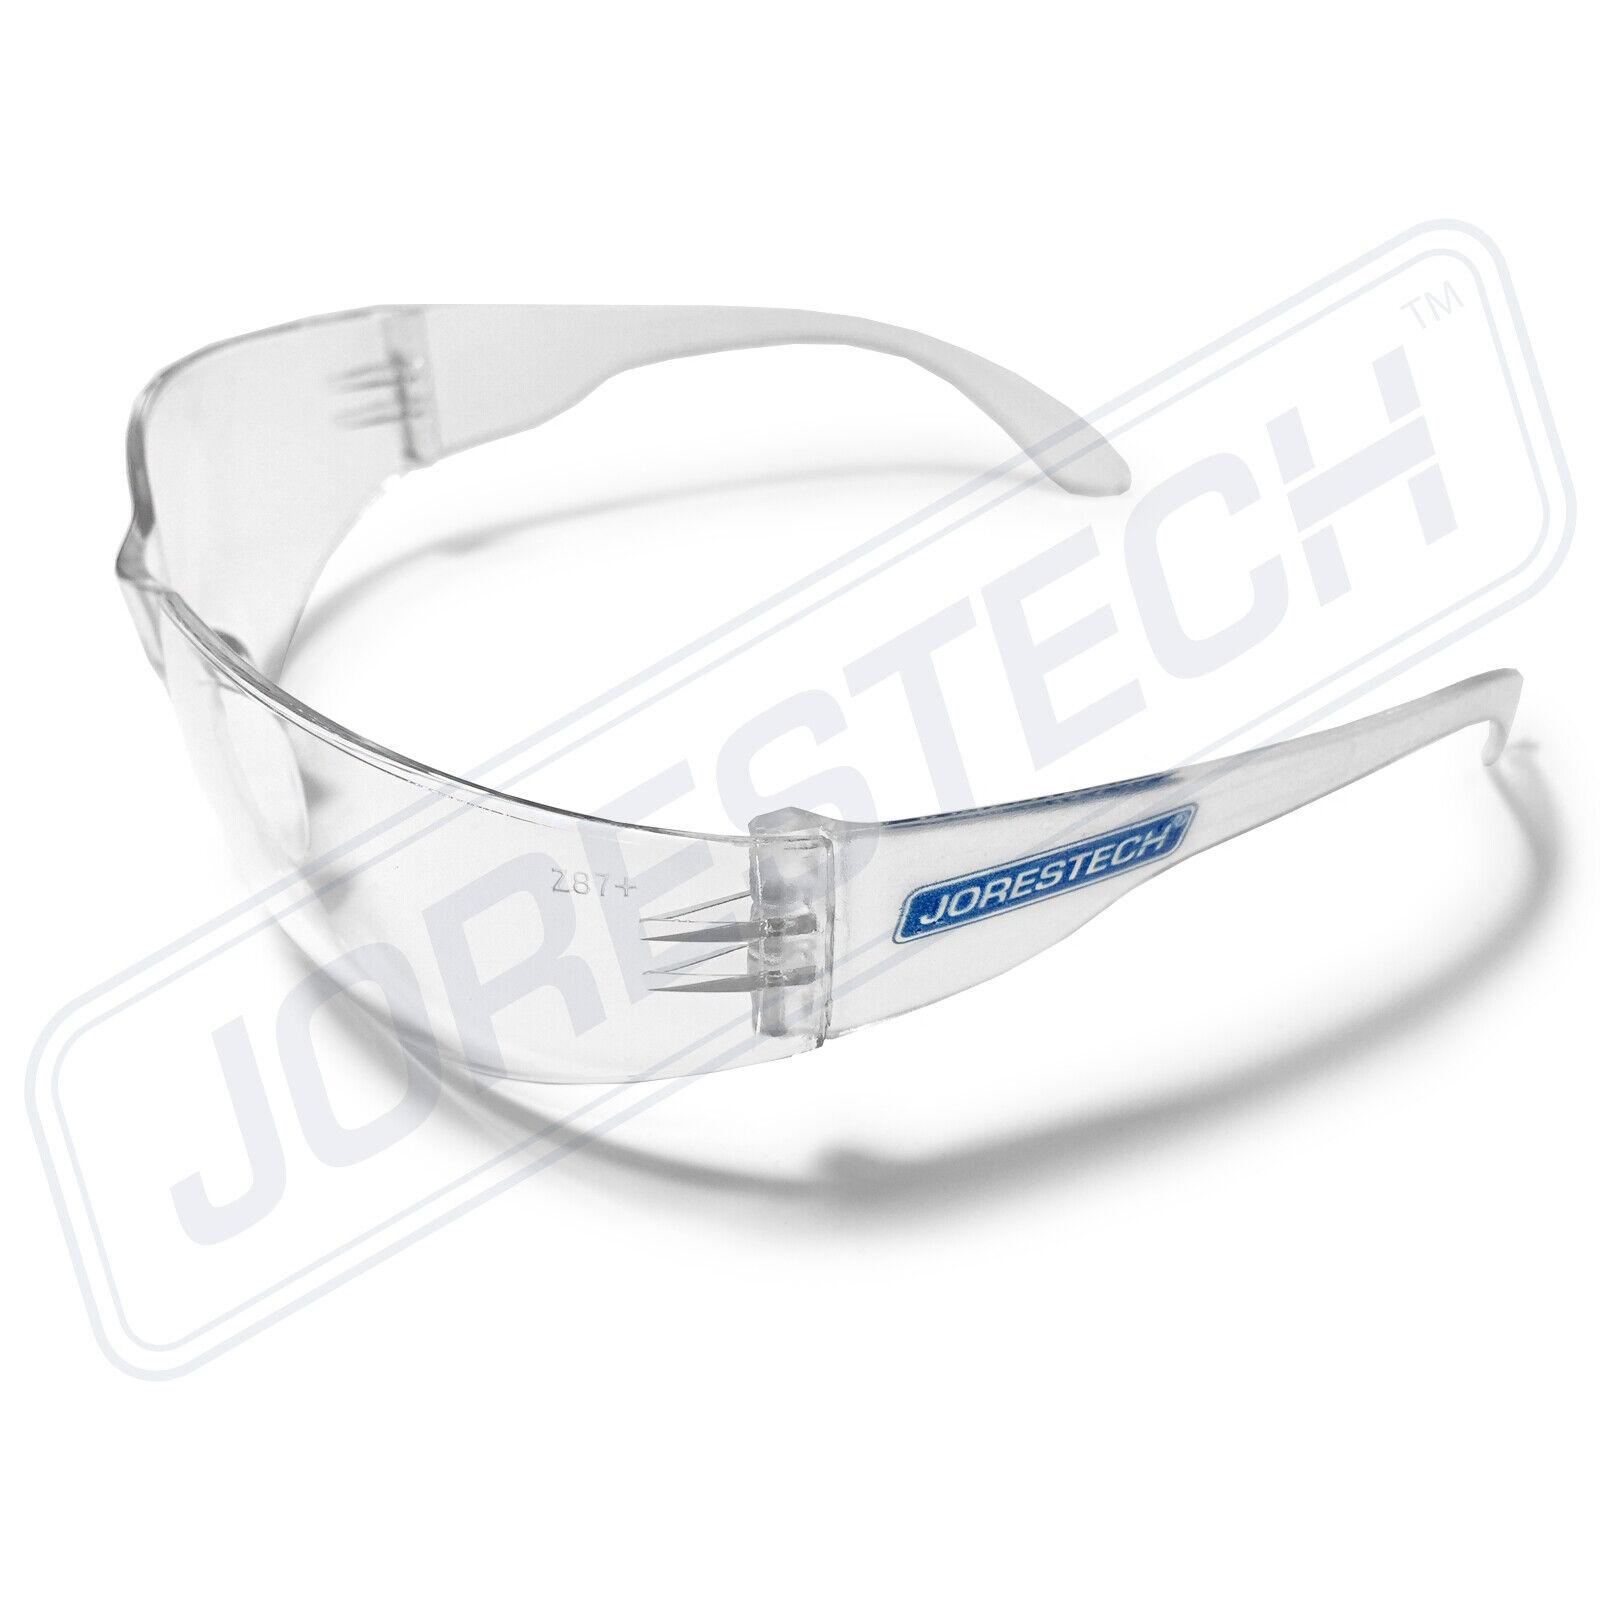 12 PAIR JORESTECH CLEAR UV LENS LOT SAFETY GLASSES BULK NEW 144 PAIRS